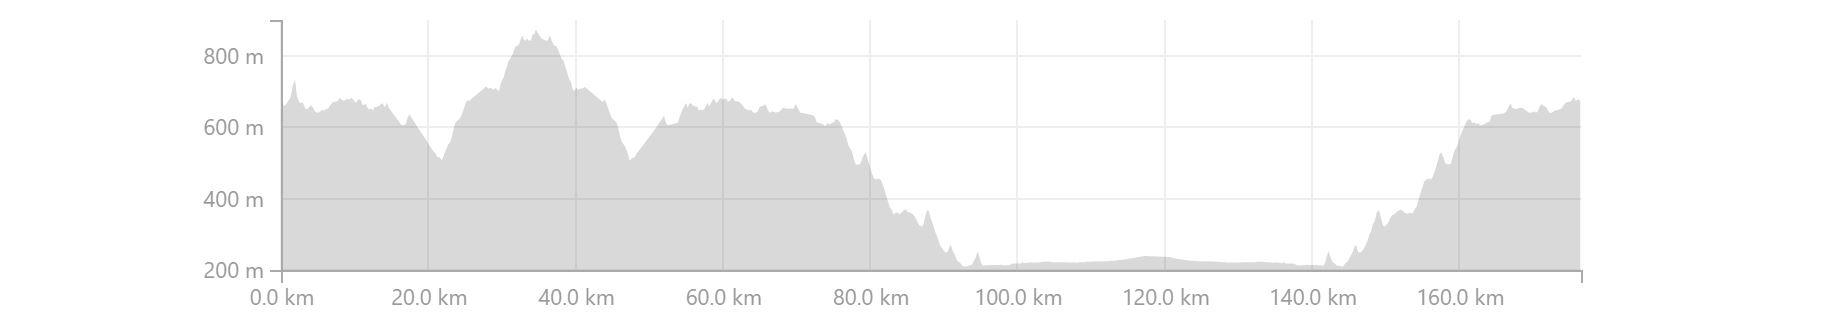 IMC elevation.JPG